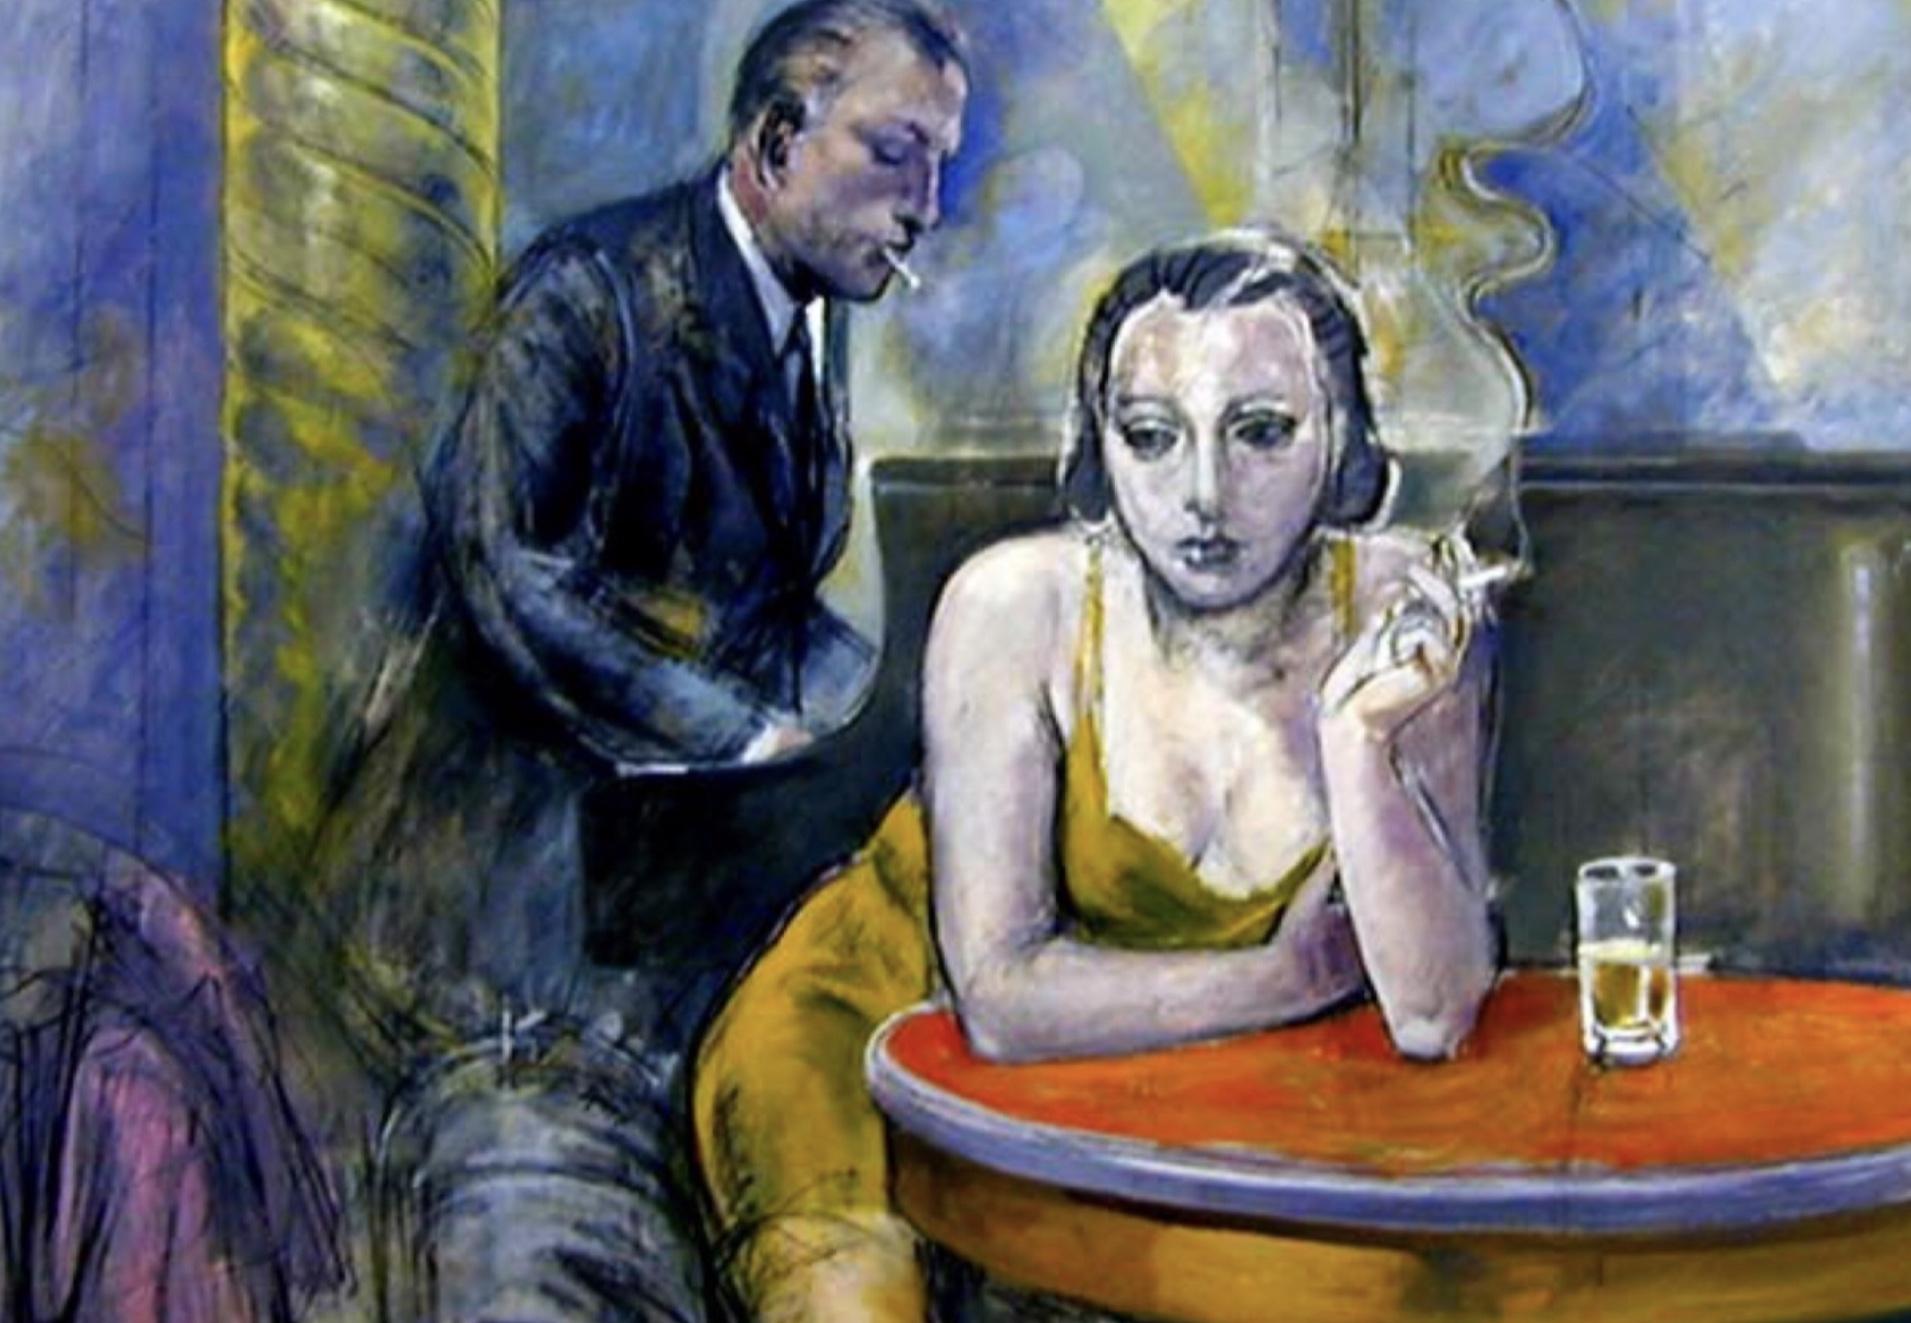 Alberto Sughi, le réalisme existentiel